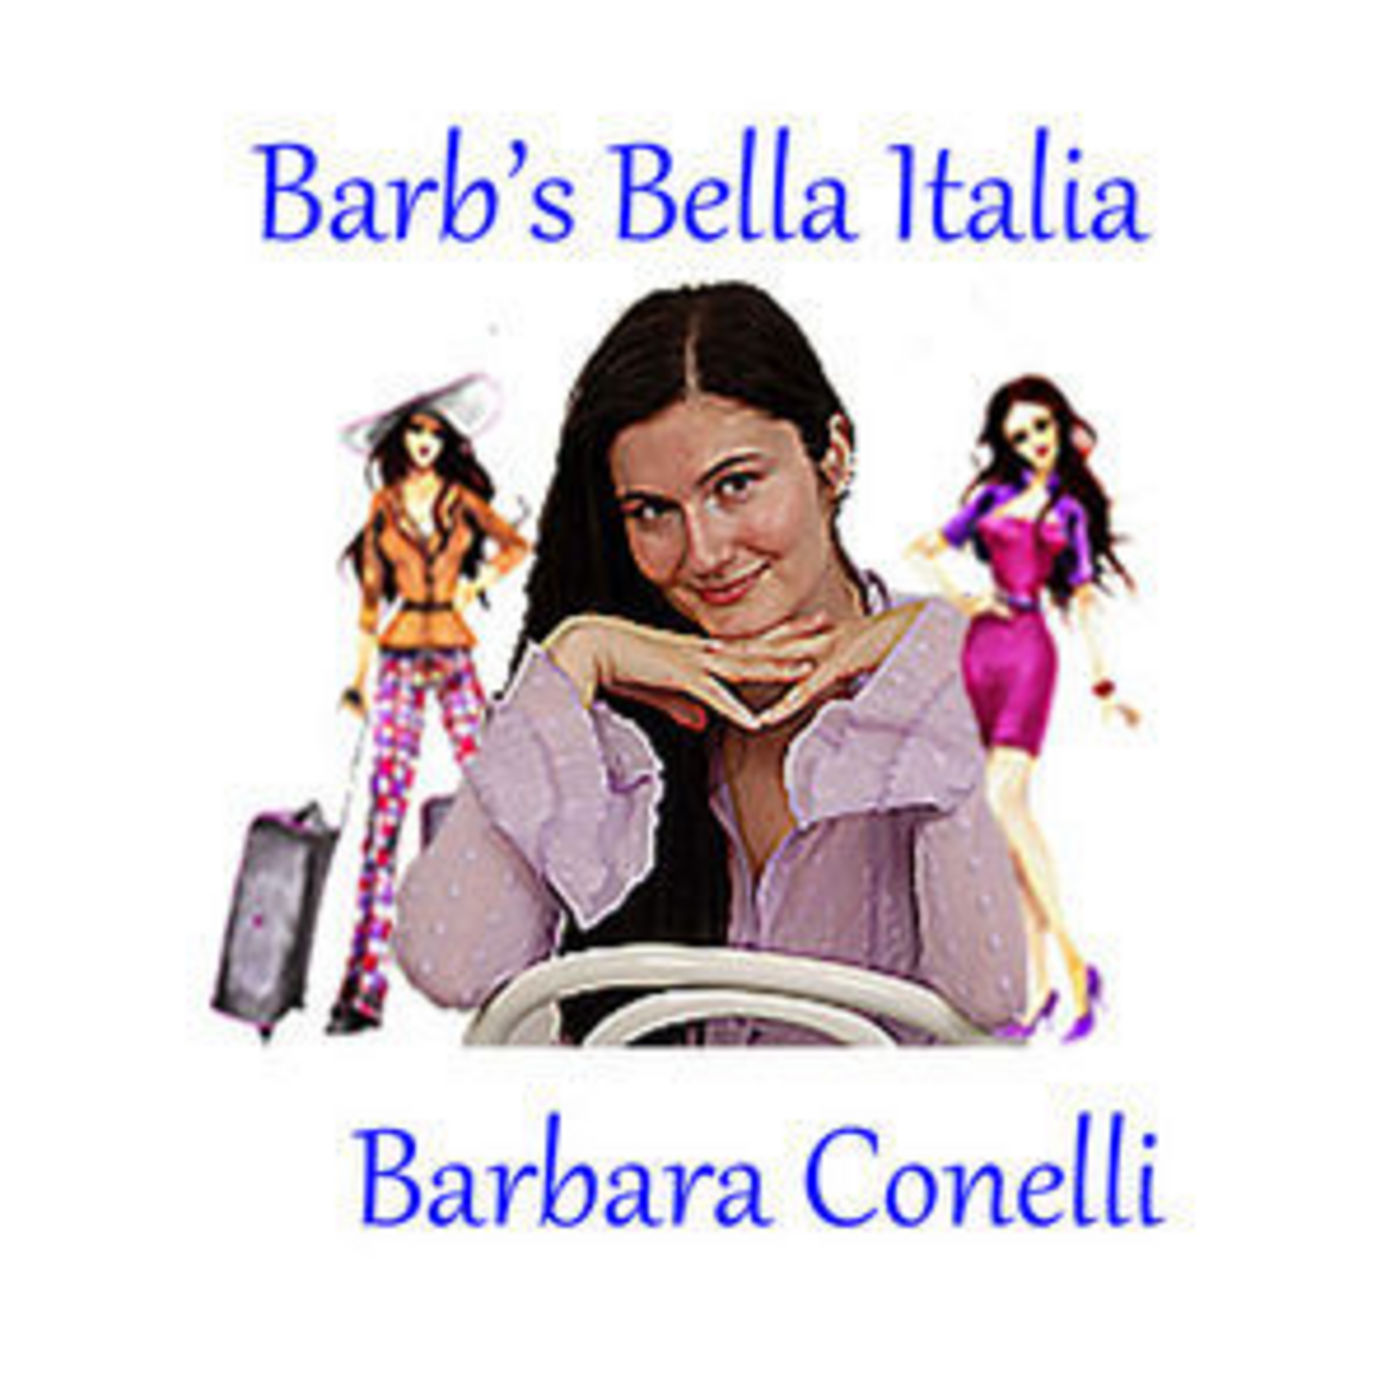 Barb's Bella Italia